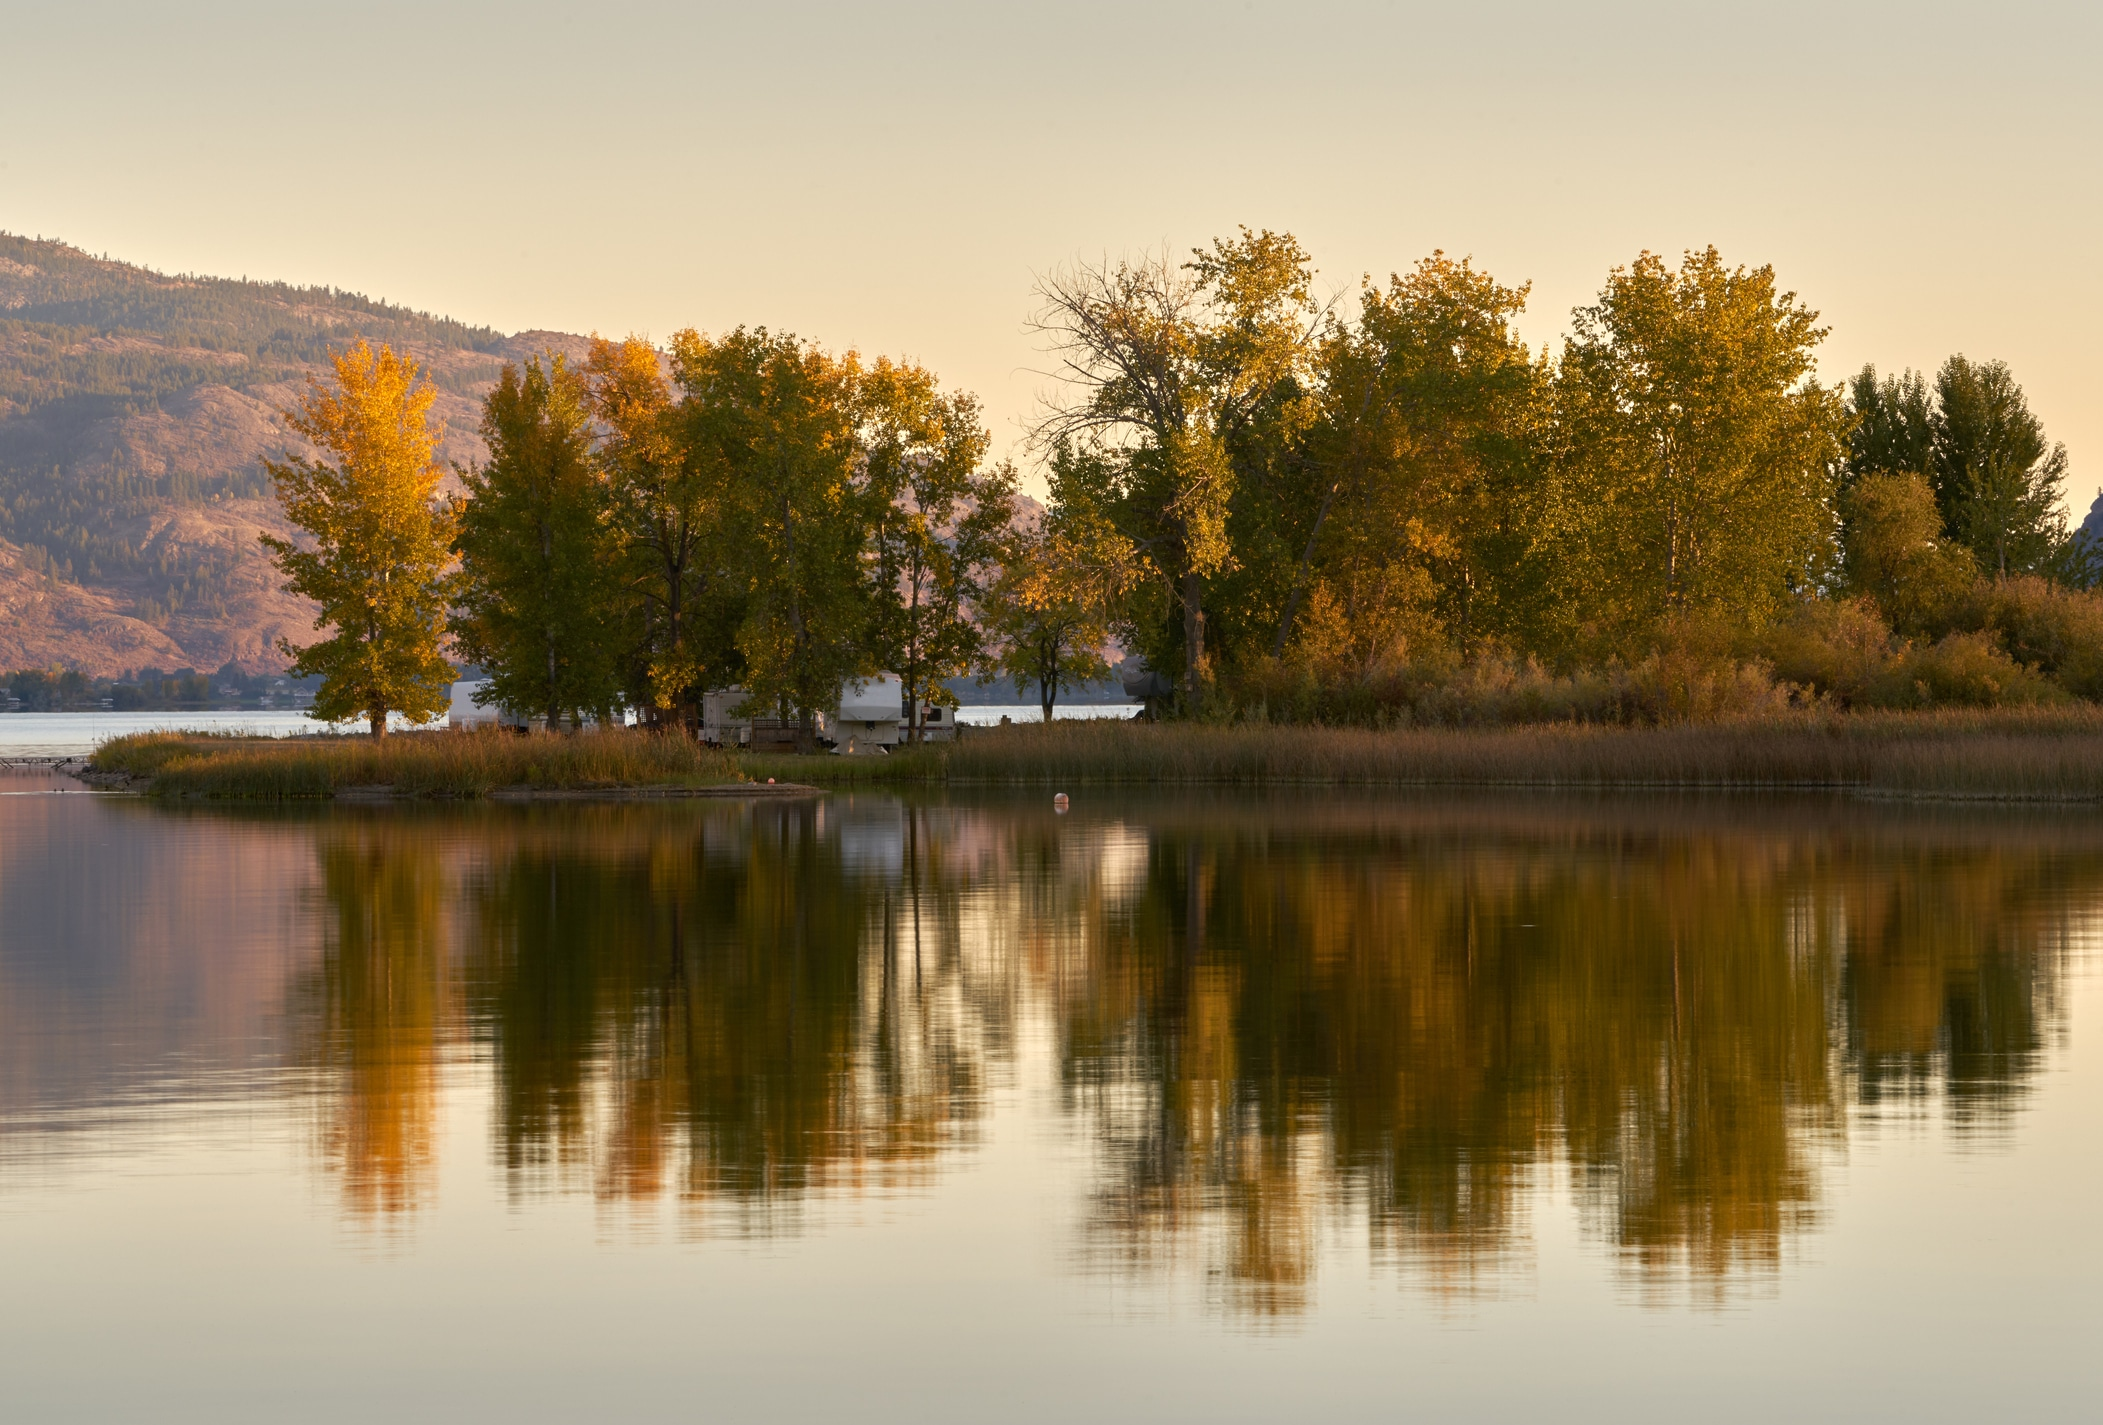 RVs at a lakeside retreat.